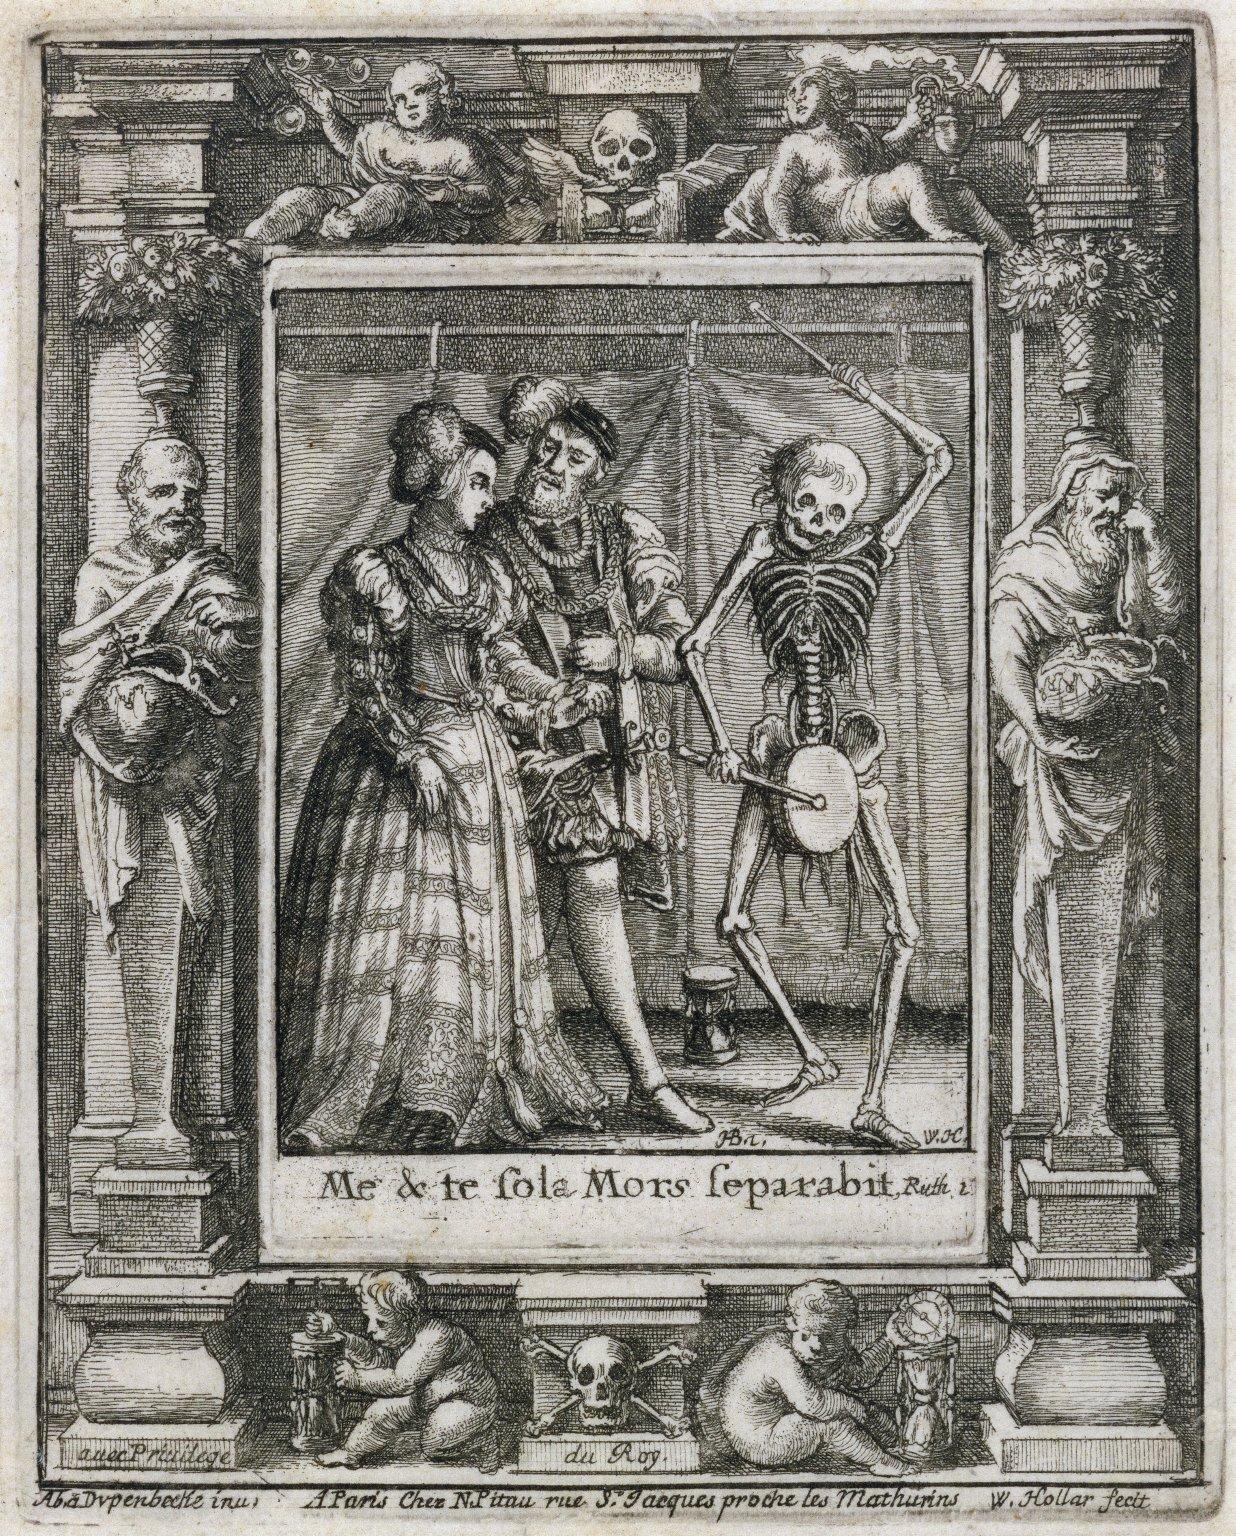 Me & te sola mors separabit, Ruth 2 [graphic] / H.B. i. [center plate] ; W.H. [center plate] ; Ab. à Dvpenbeché inu. [border] ; W. Hollar fecit [border].